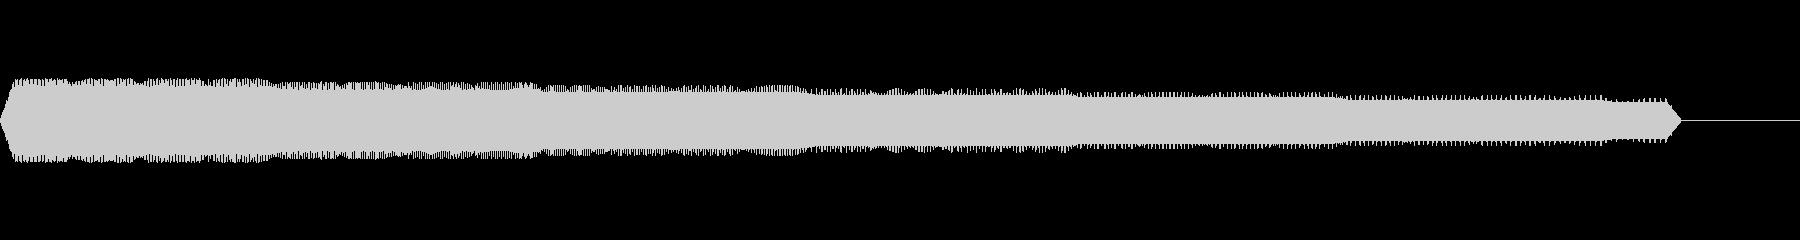 8bitグリッサンド(ピロロロロ↓)03の未再生の波形